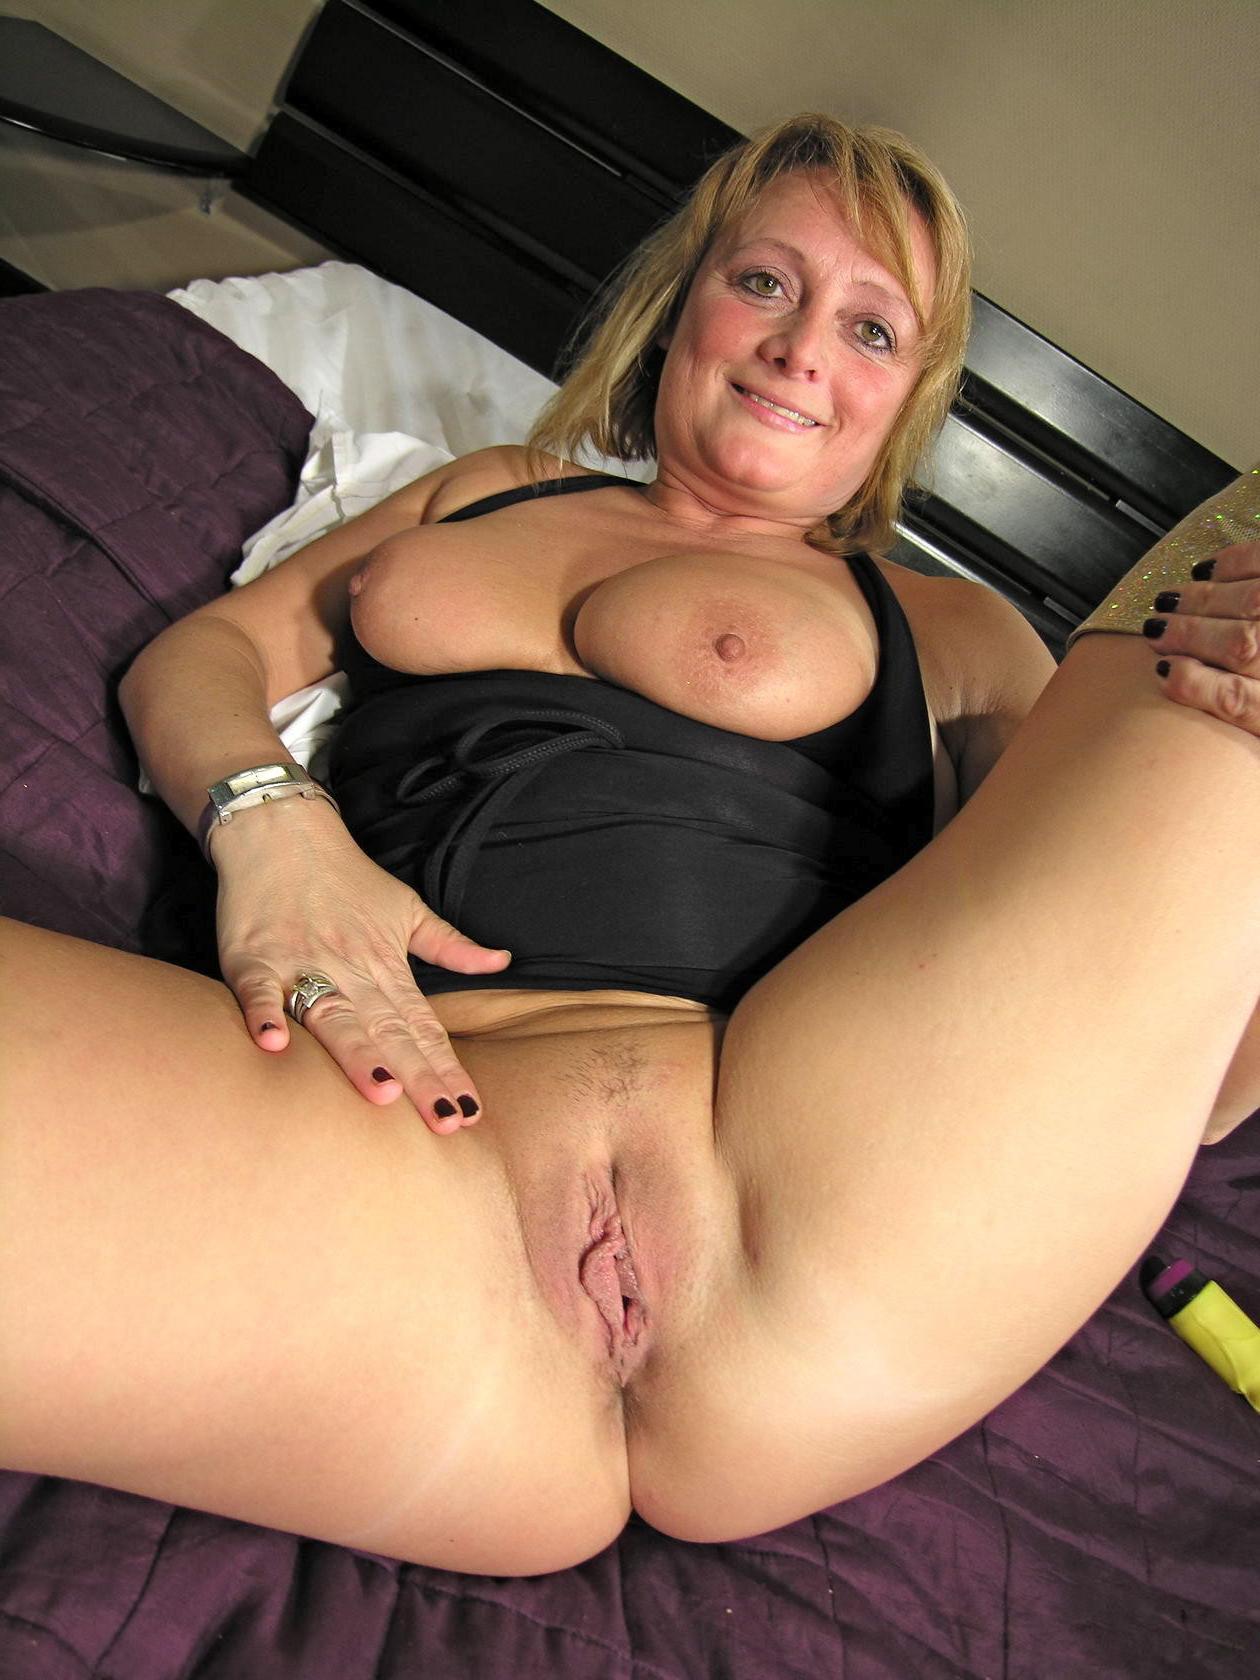 Porno vagina pic gallery